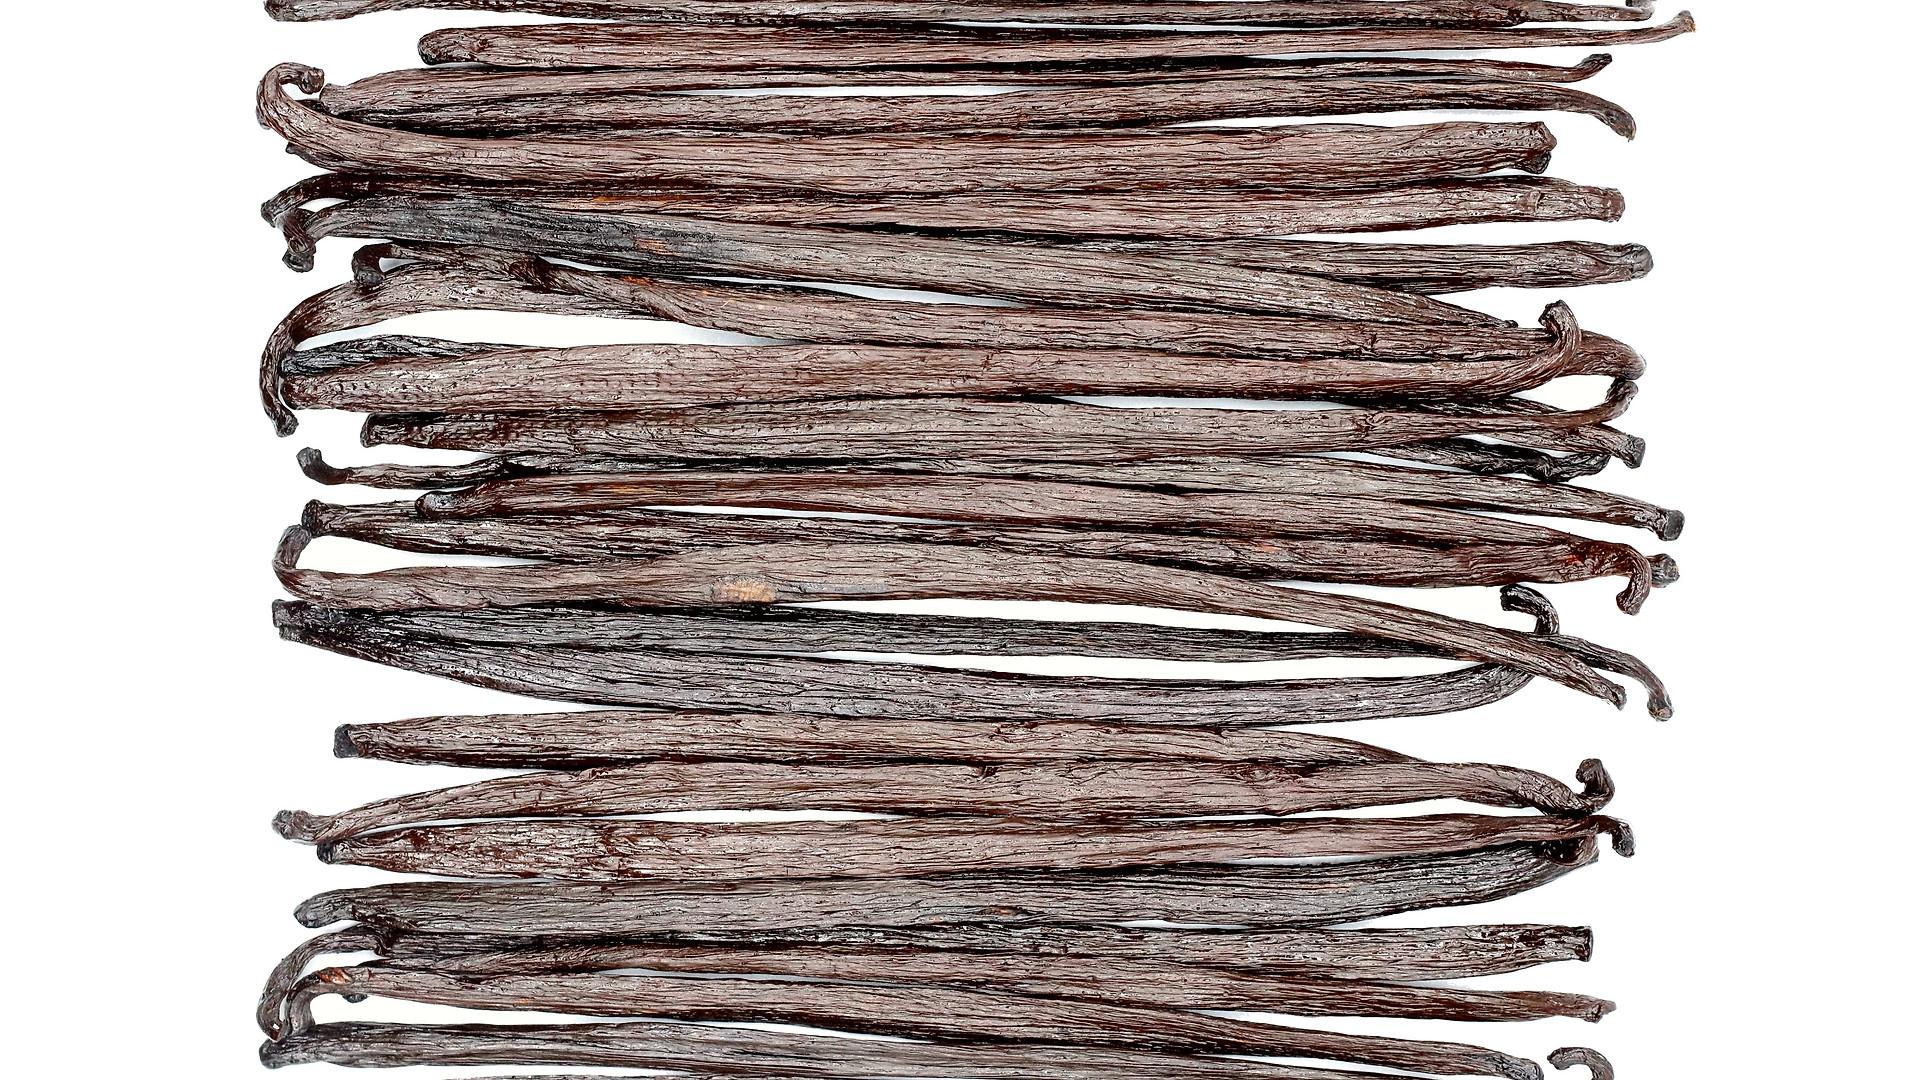 Mexican Vanilla Beans - Extract Grade (Grade B)